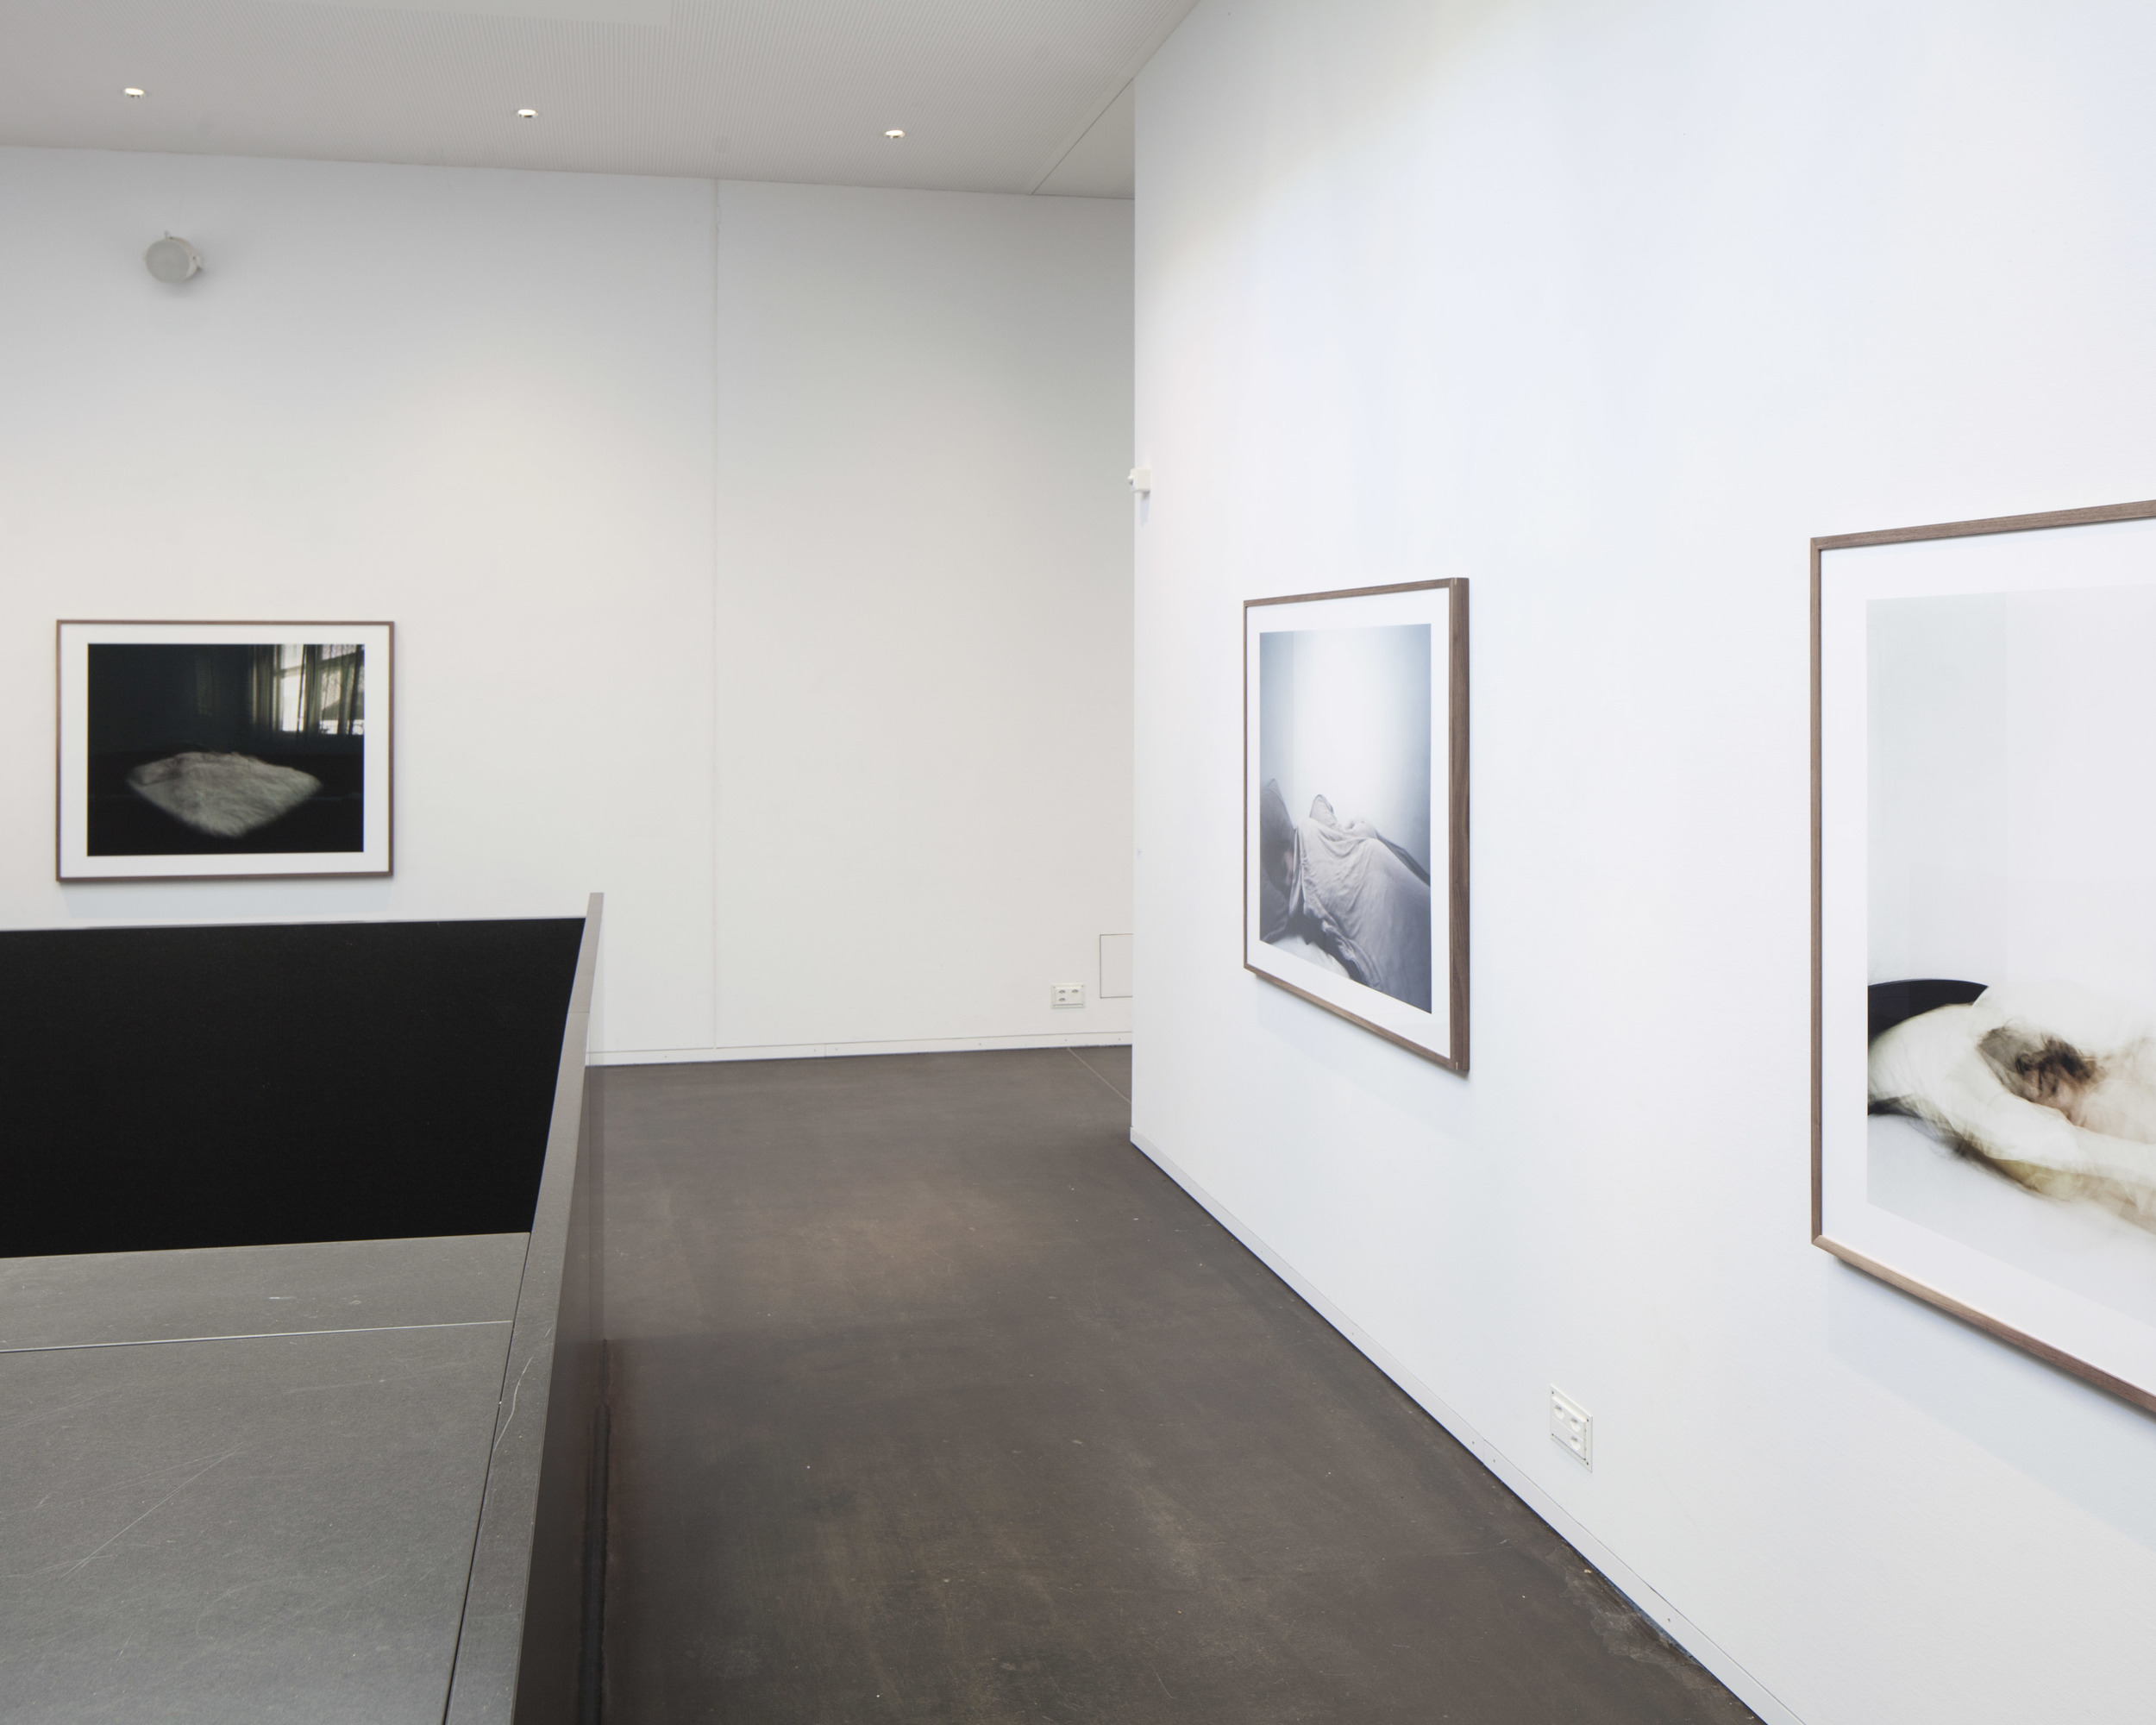 Oeuvres: Eduardo Serafim